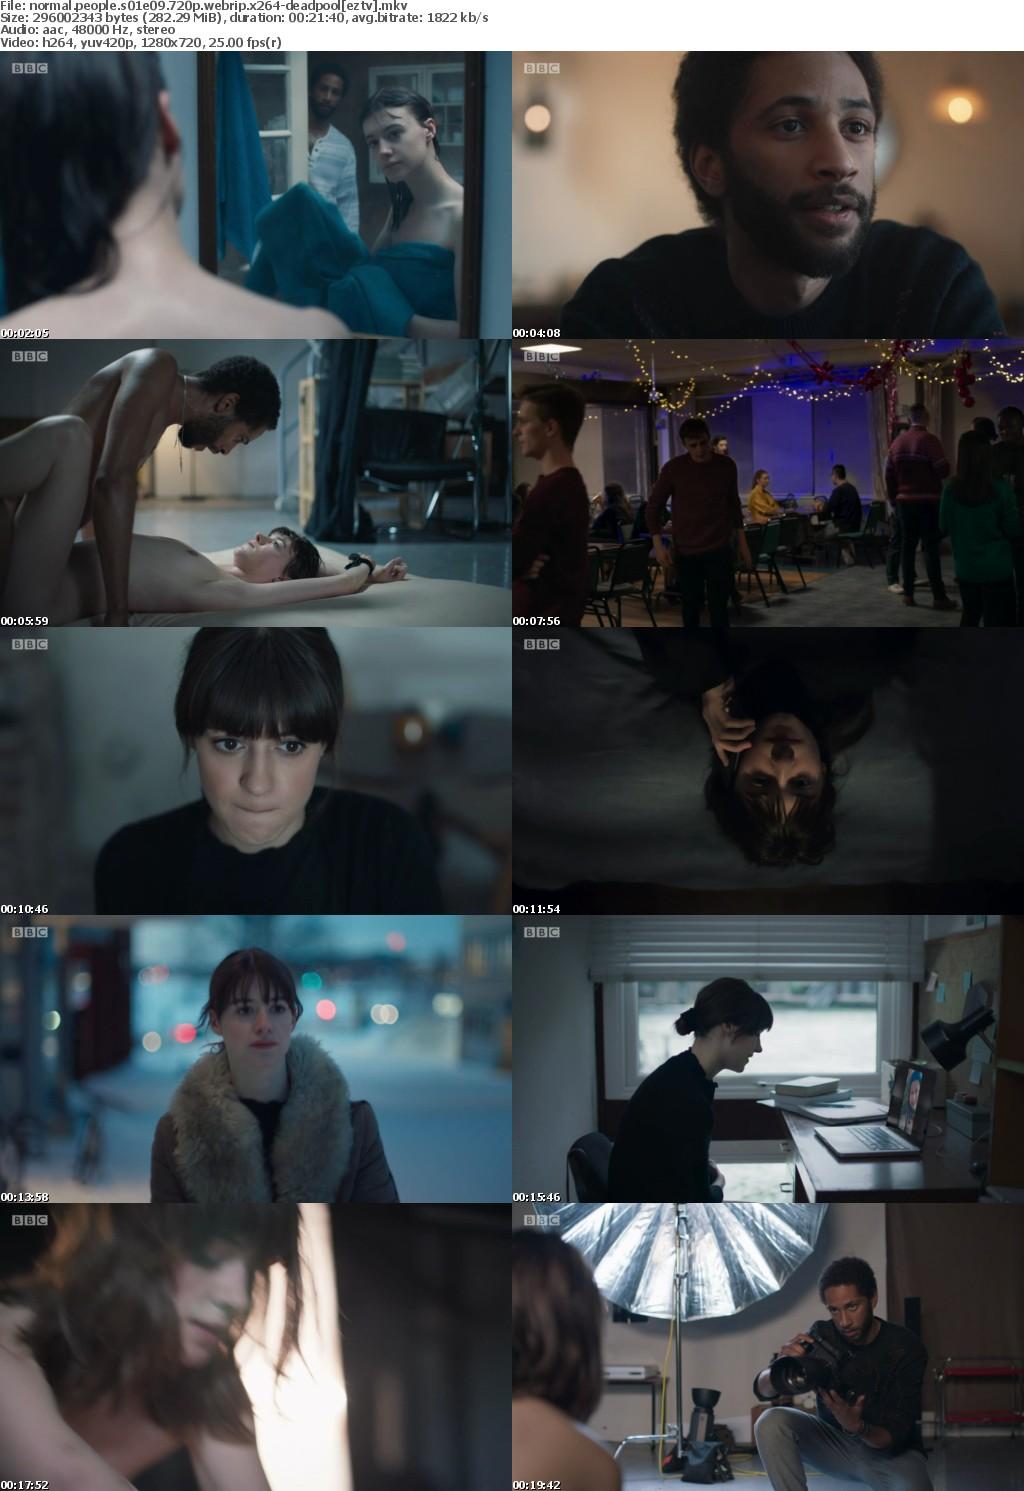 Normal People S01E09 720p WEBRip X264-DEADPOOL